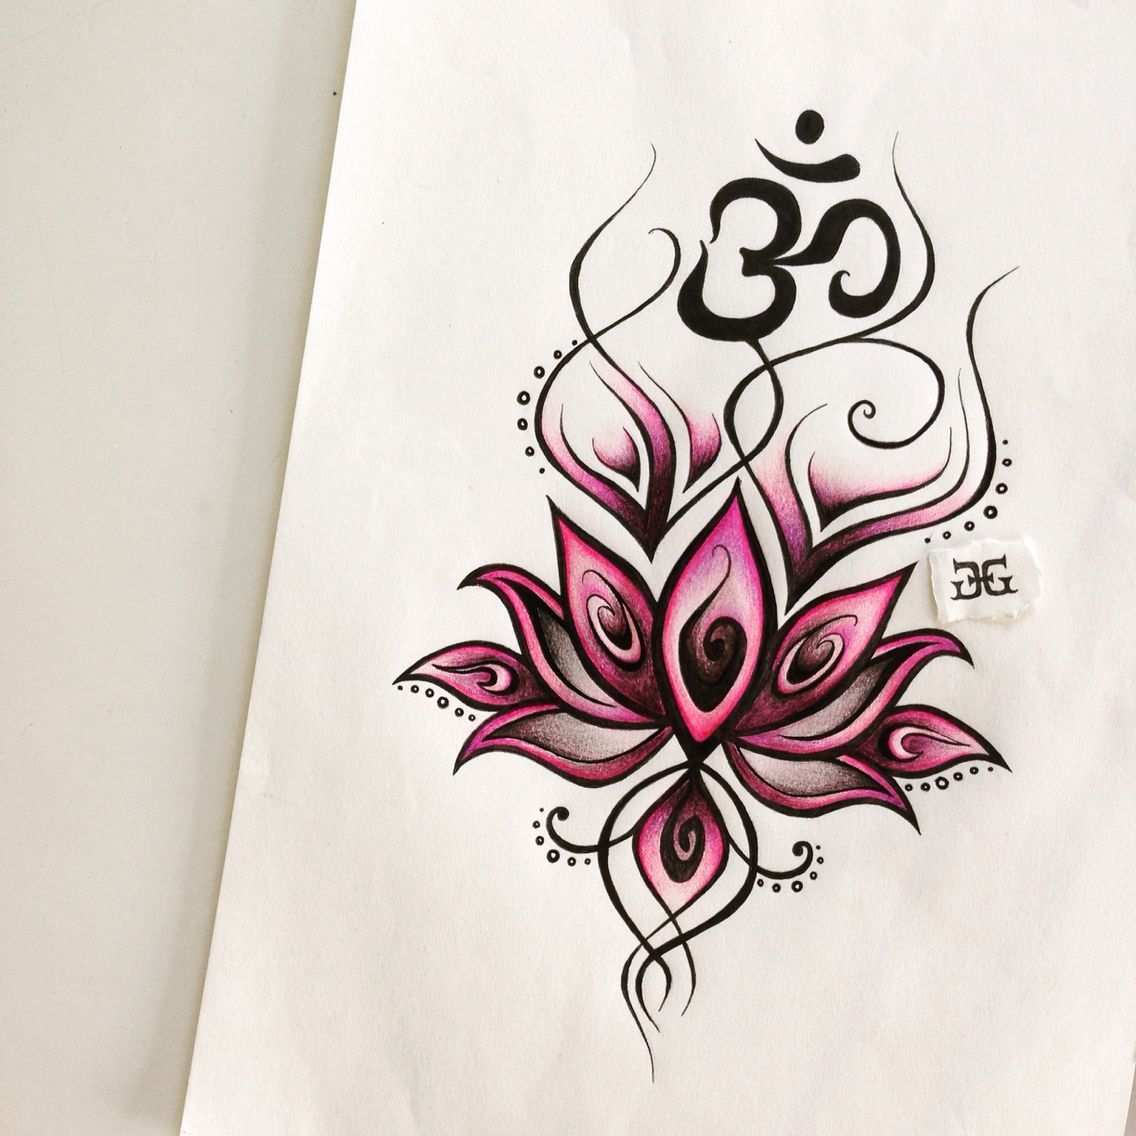 Image Result For Om Symbol Tattoo Tattoo Ideen Unterarm Frau Tattoo Ideen Unterarm Tattoo Vorlagen